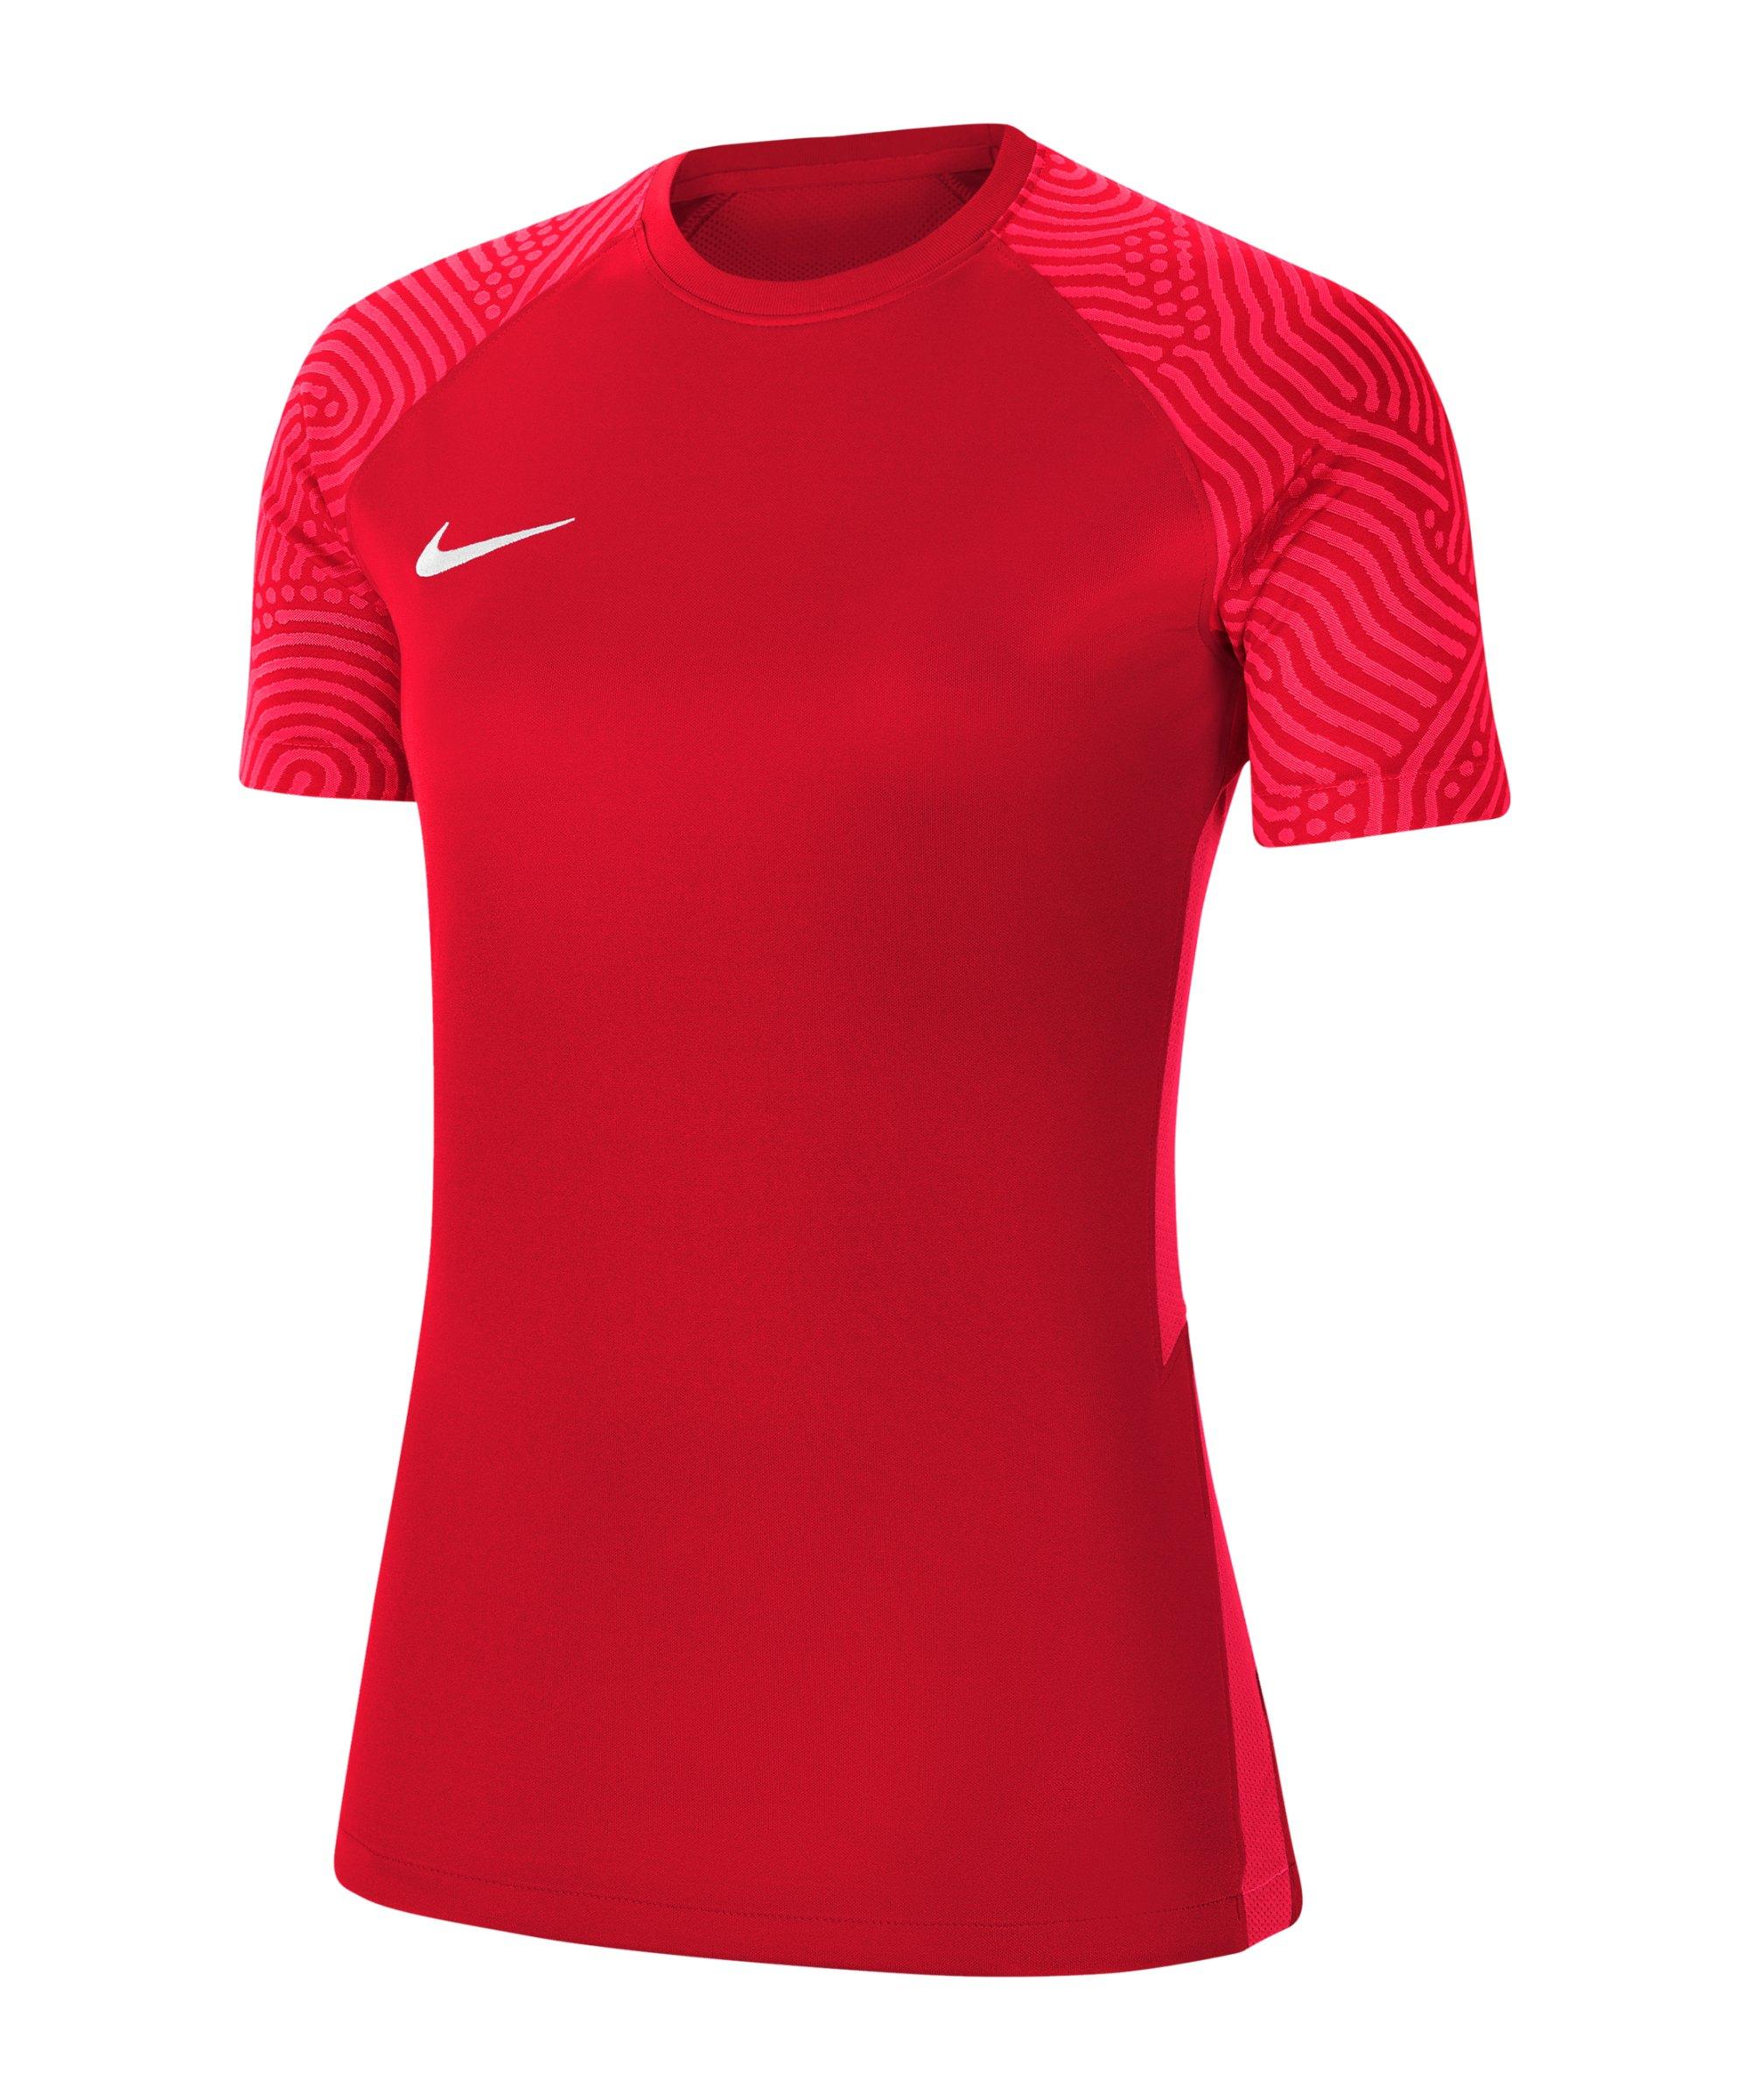 Nike Strike 2 Trikot Damen Rot Weiss F657 - rot